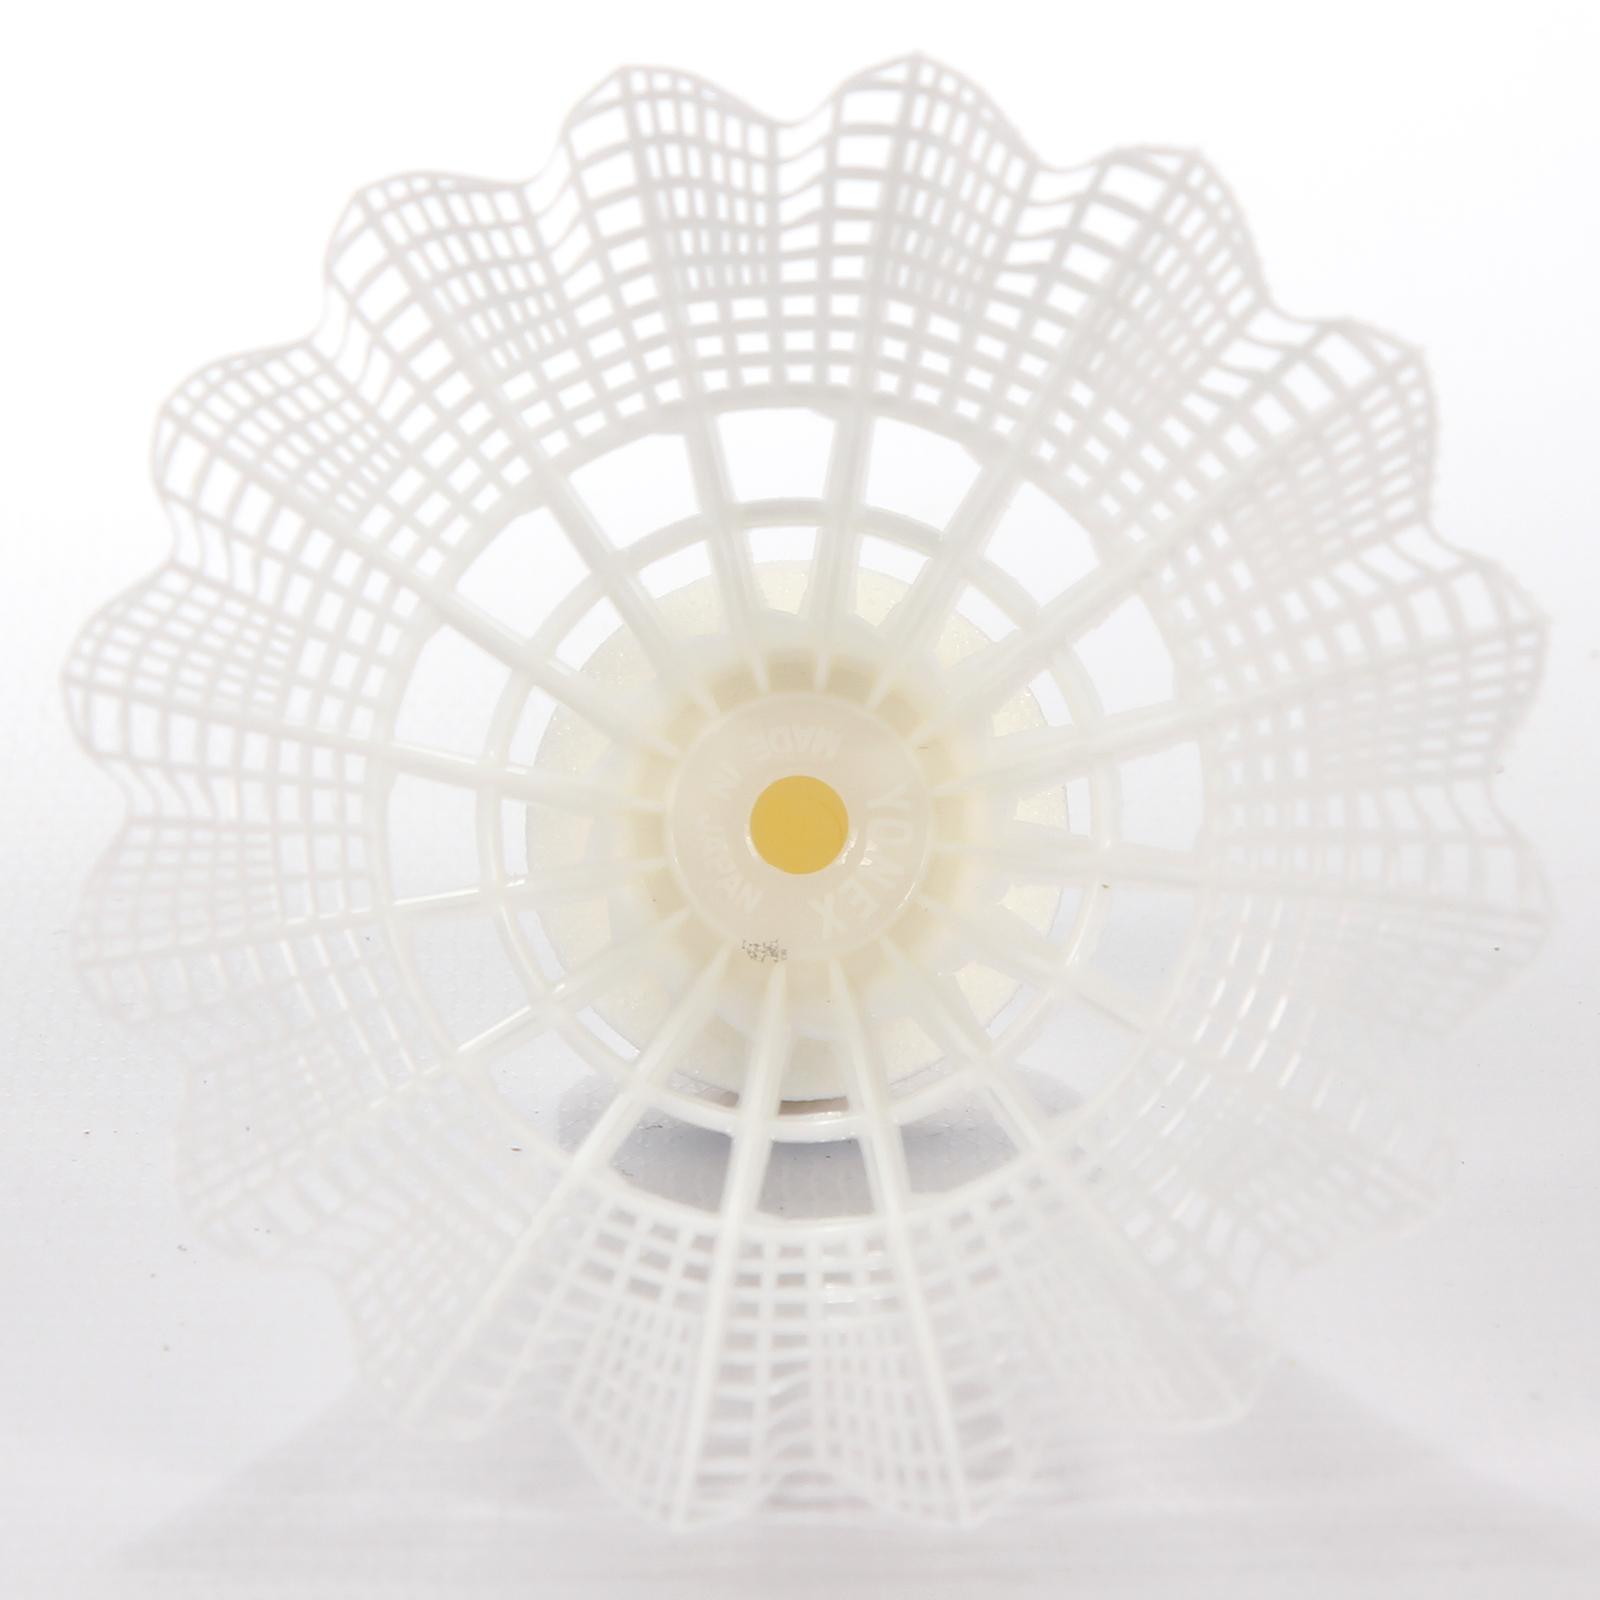 Yonex-Mavis-10-Nylon-Badminton-Shuttlecocks-White-Yellow-Shuttles-rrp-10